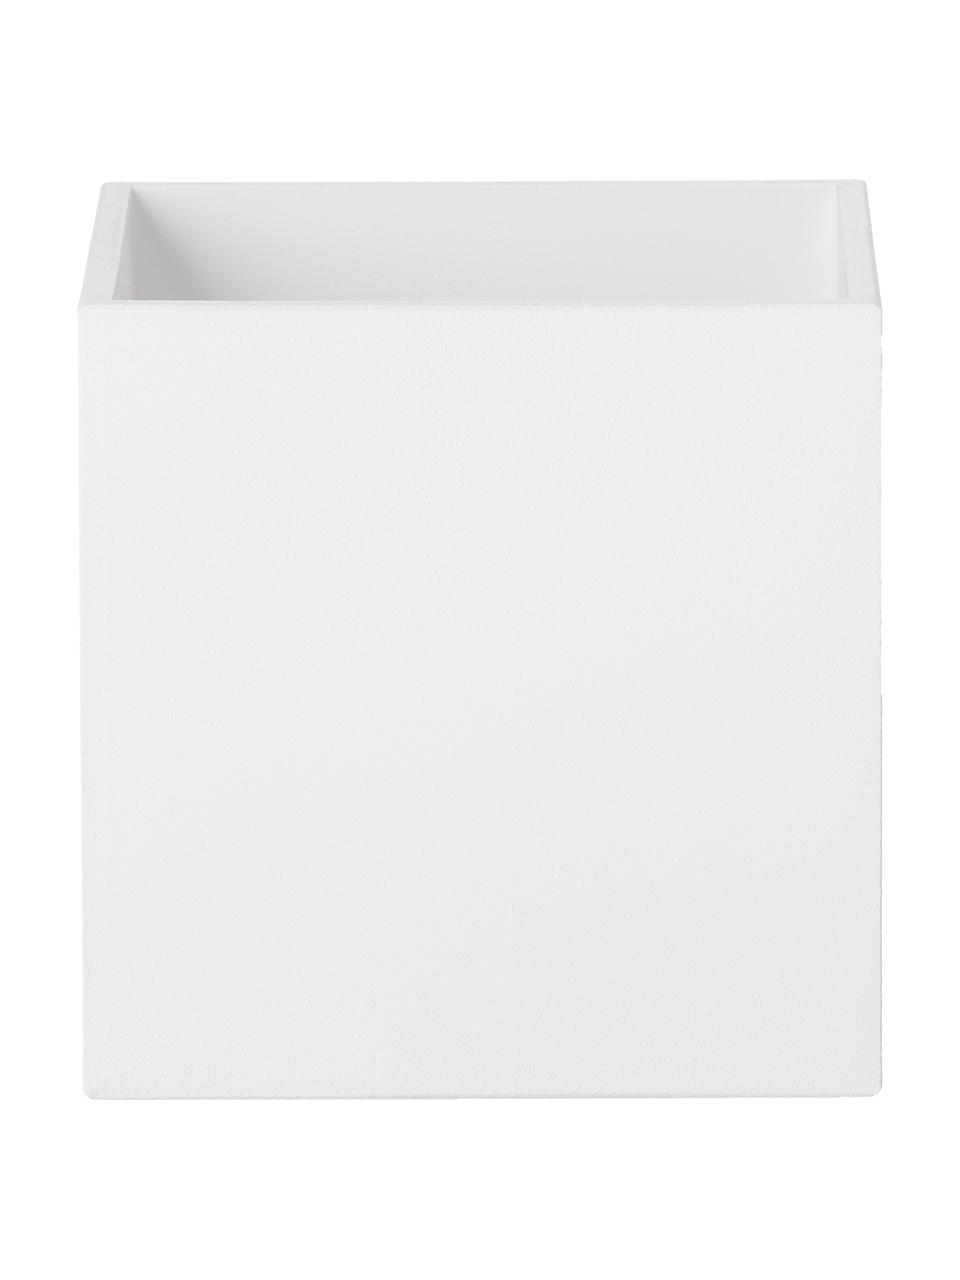 Applique murale blanche minimaliste Quad, Blanc